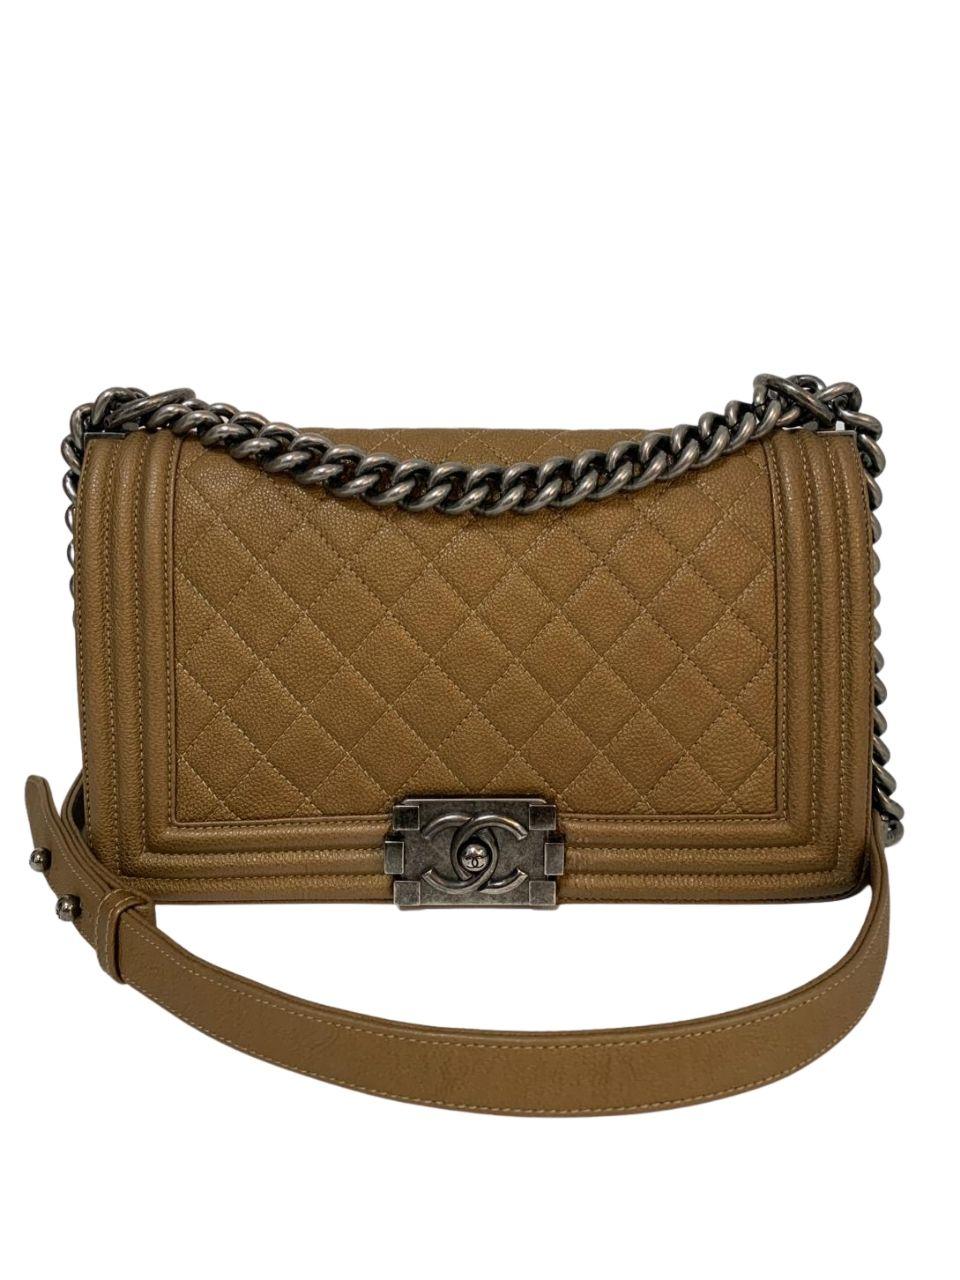 Bolsa Chanel Boy Caramelo